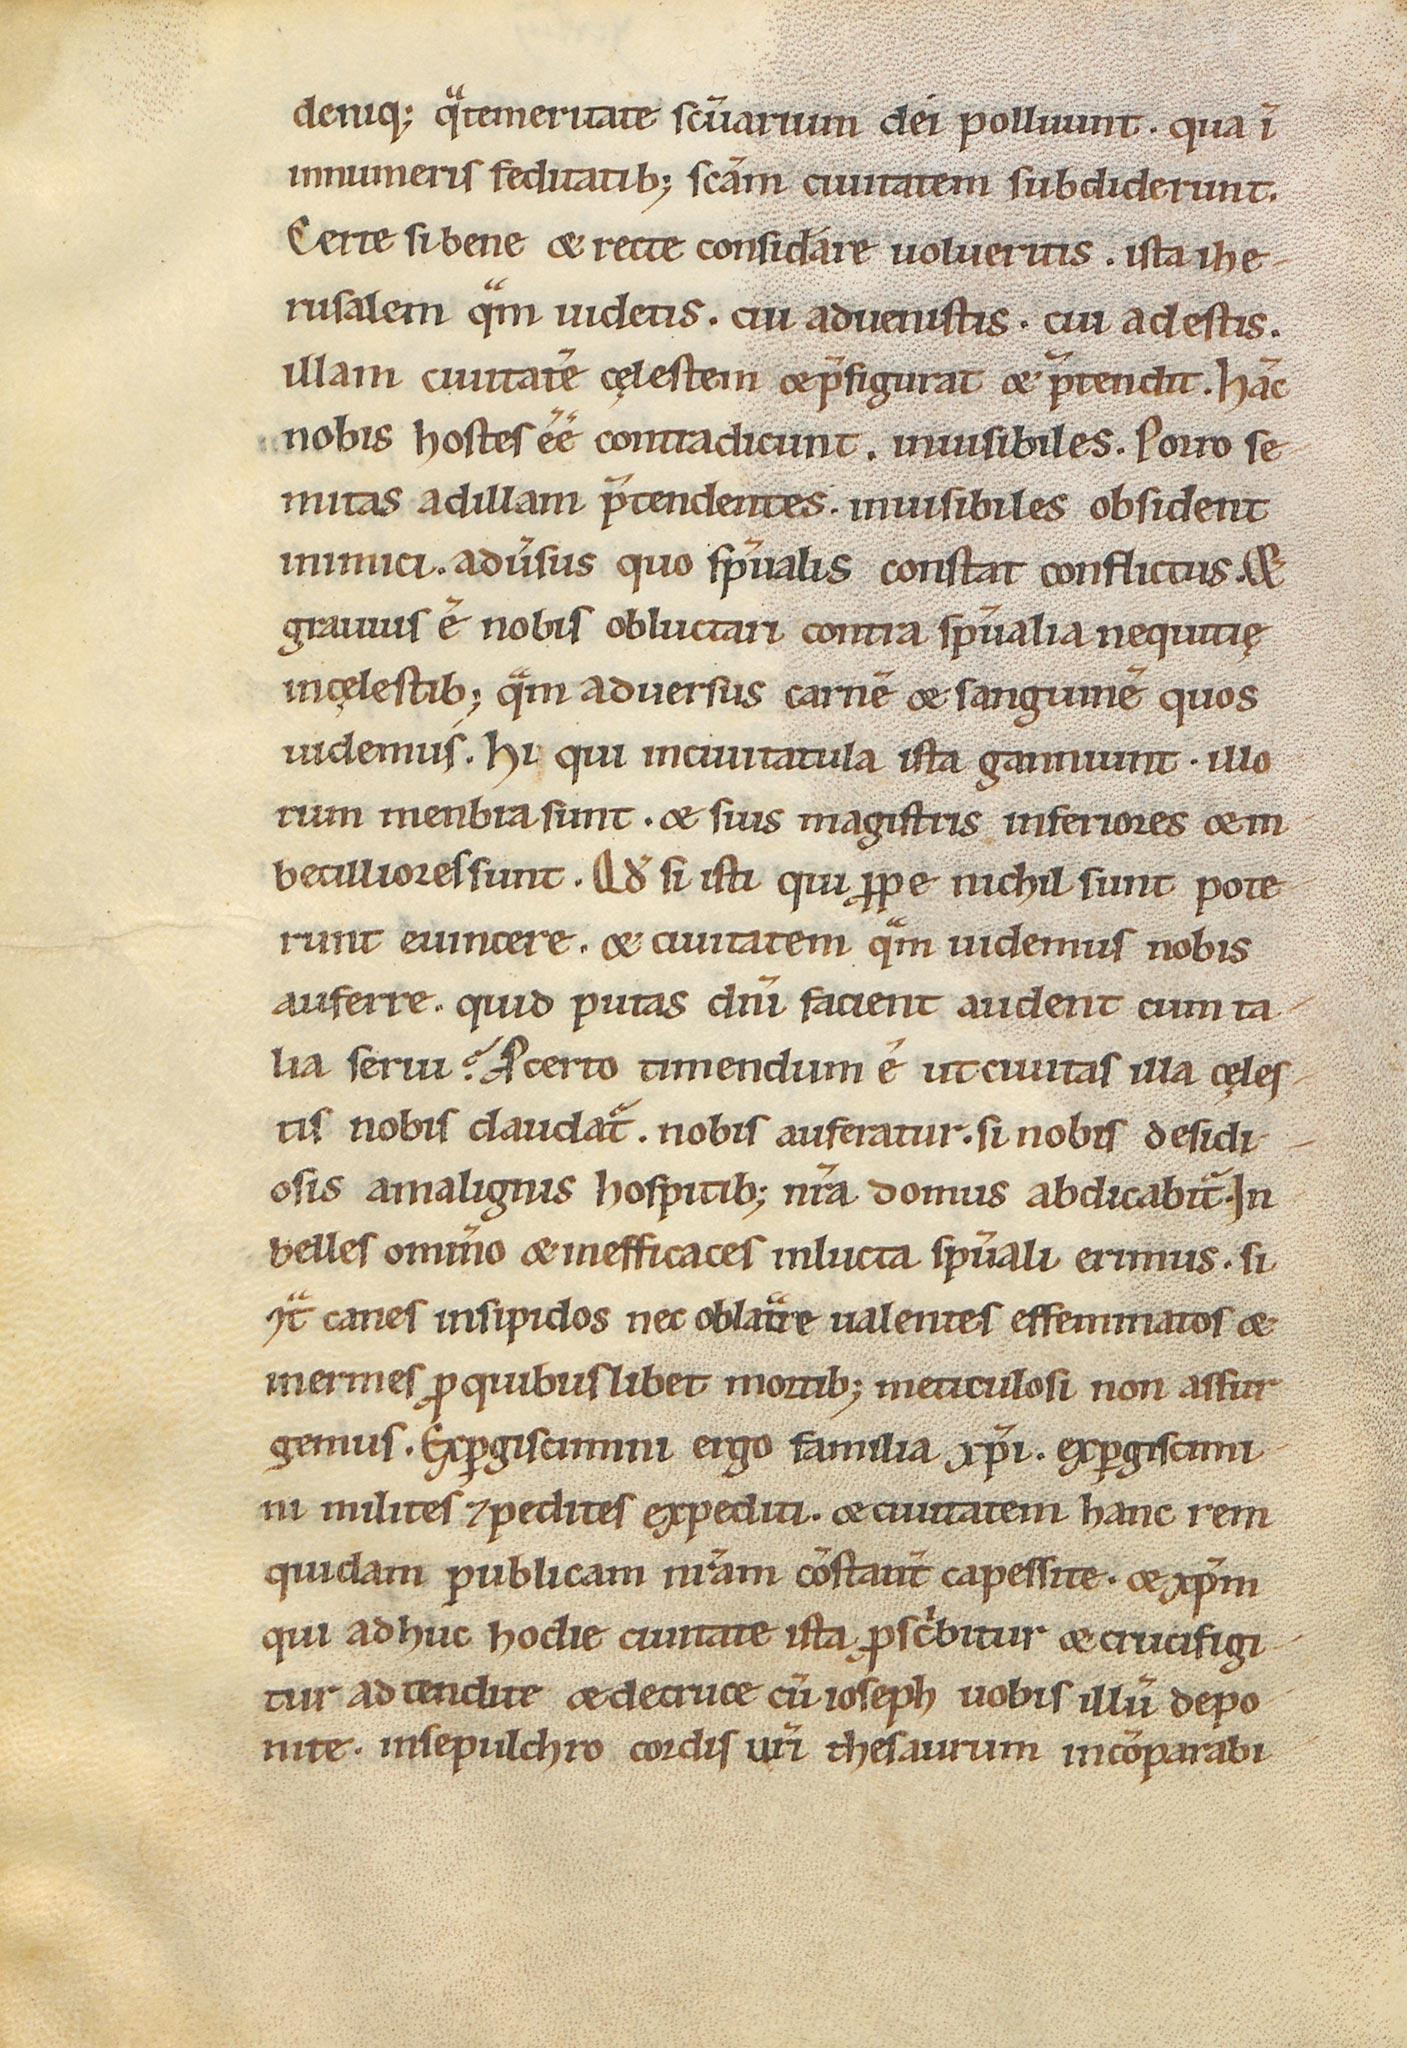 Manuscrit-Historia-Hierosolimitana-93v°